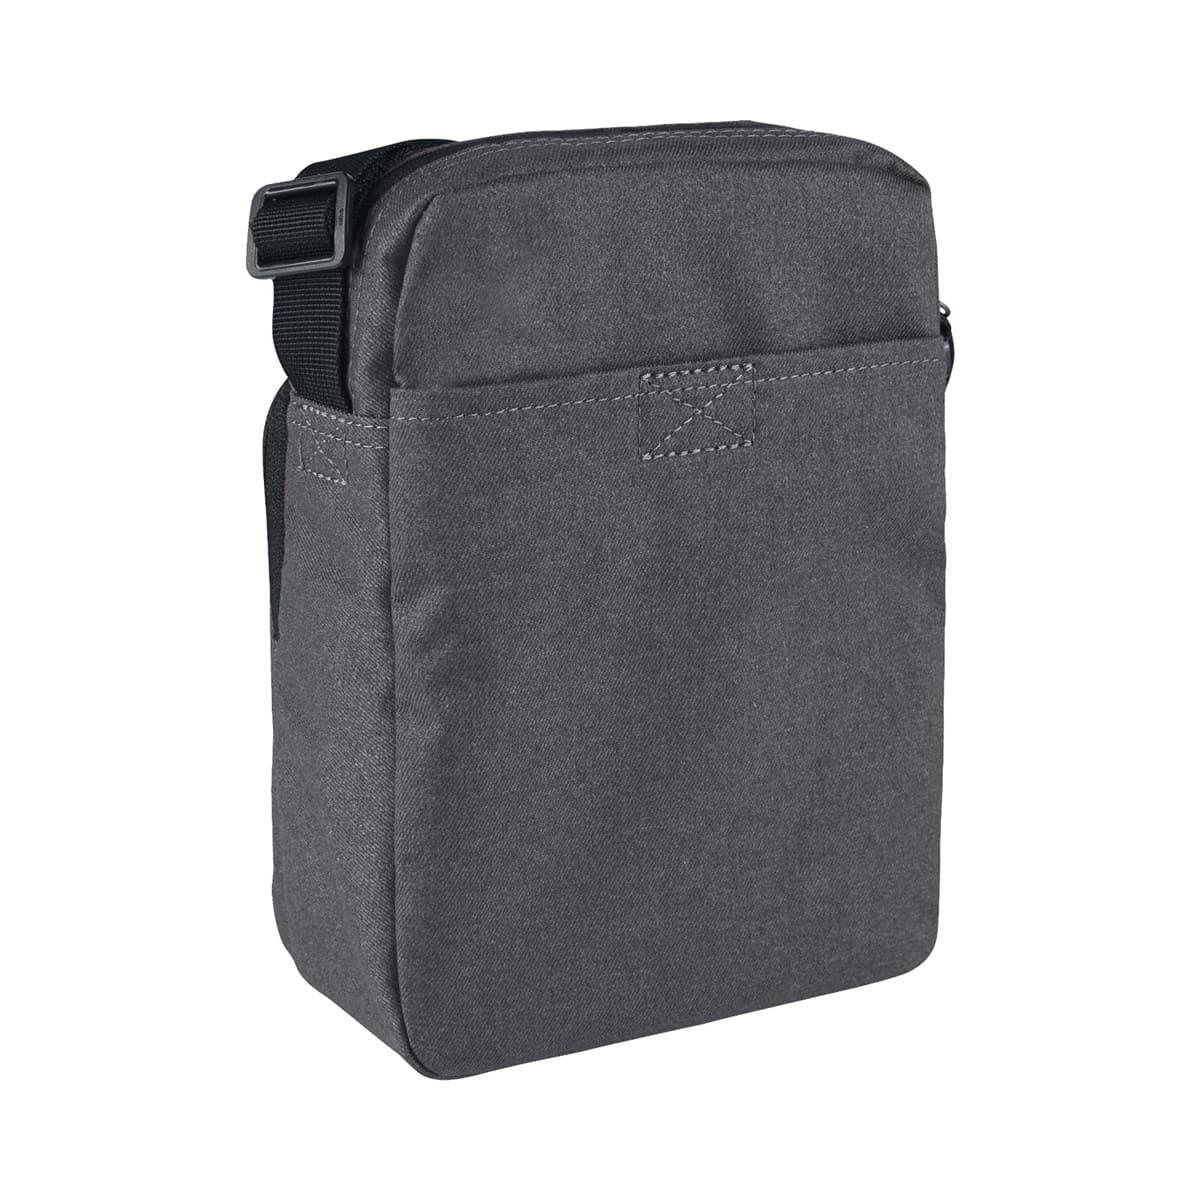 Core Small Items 3.0 Gri Omuz Çantası (BA5268-021)